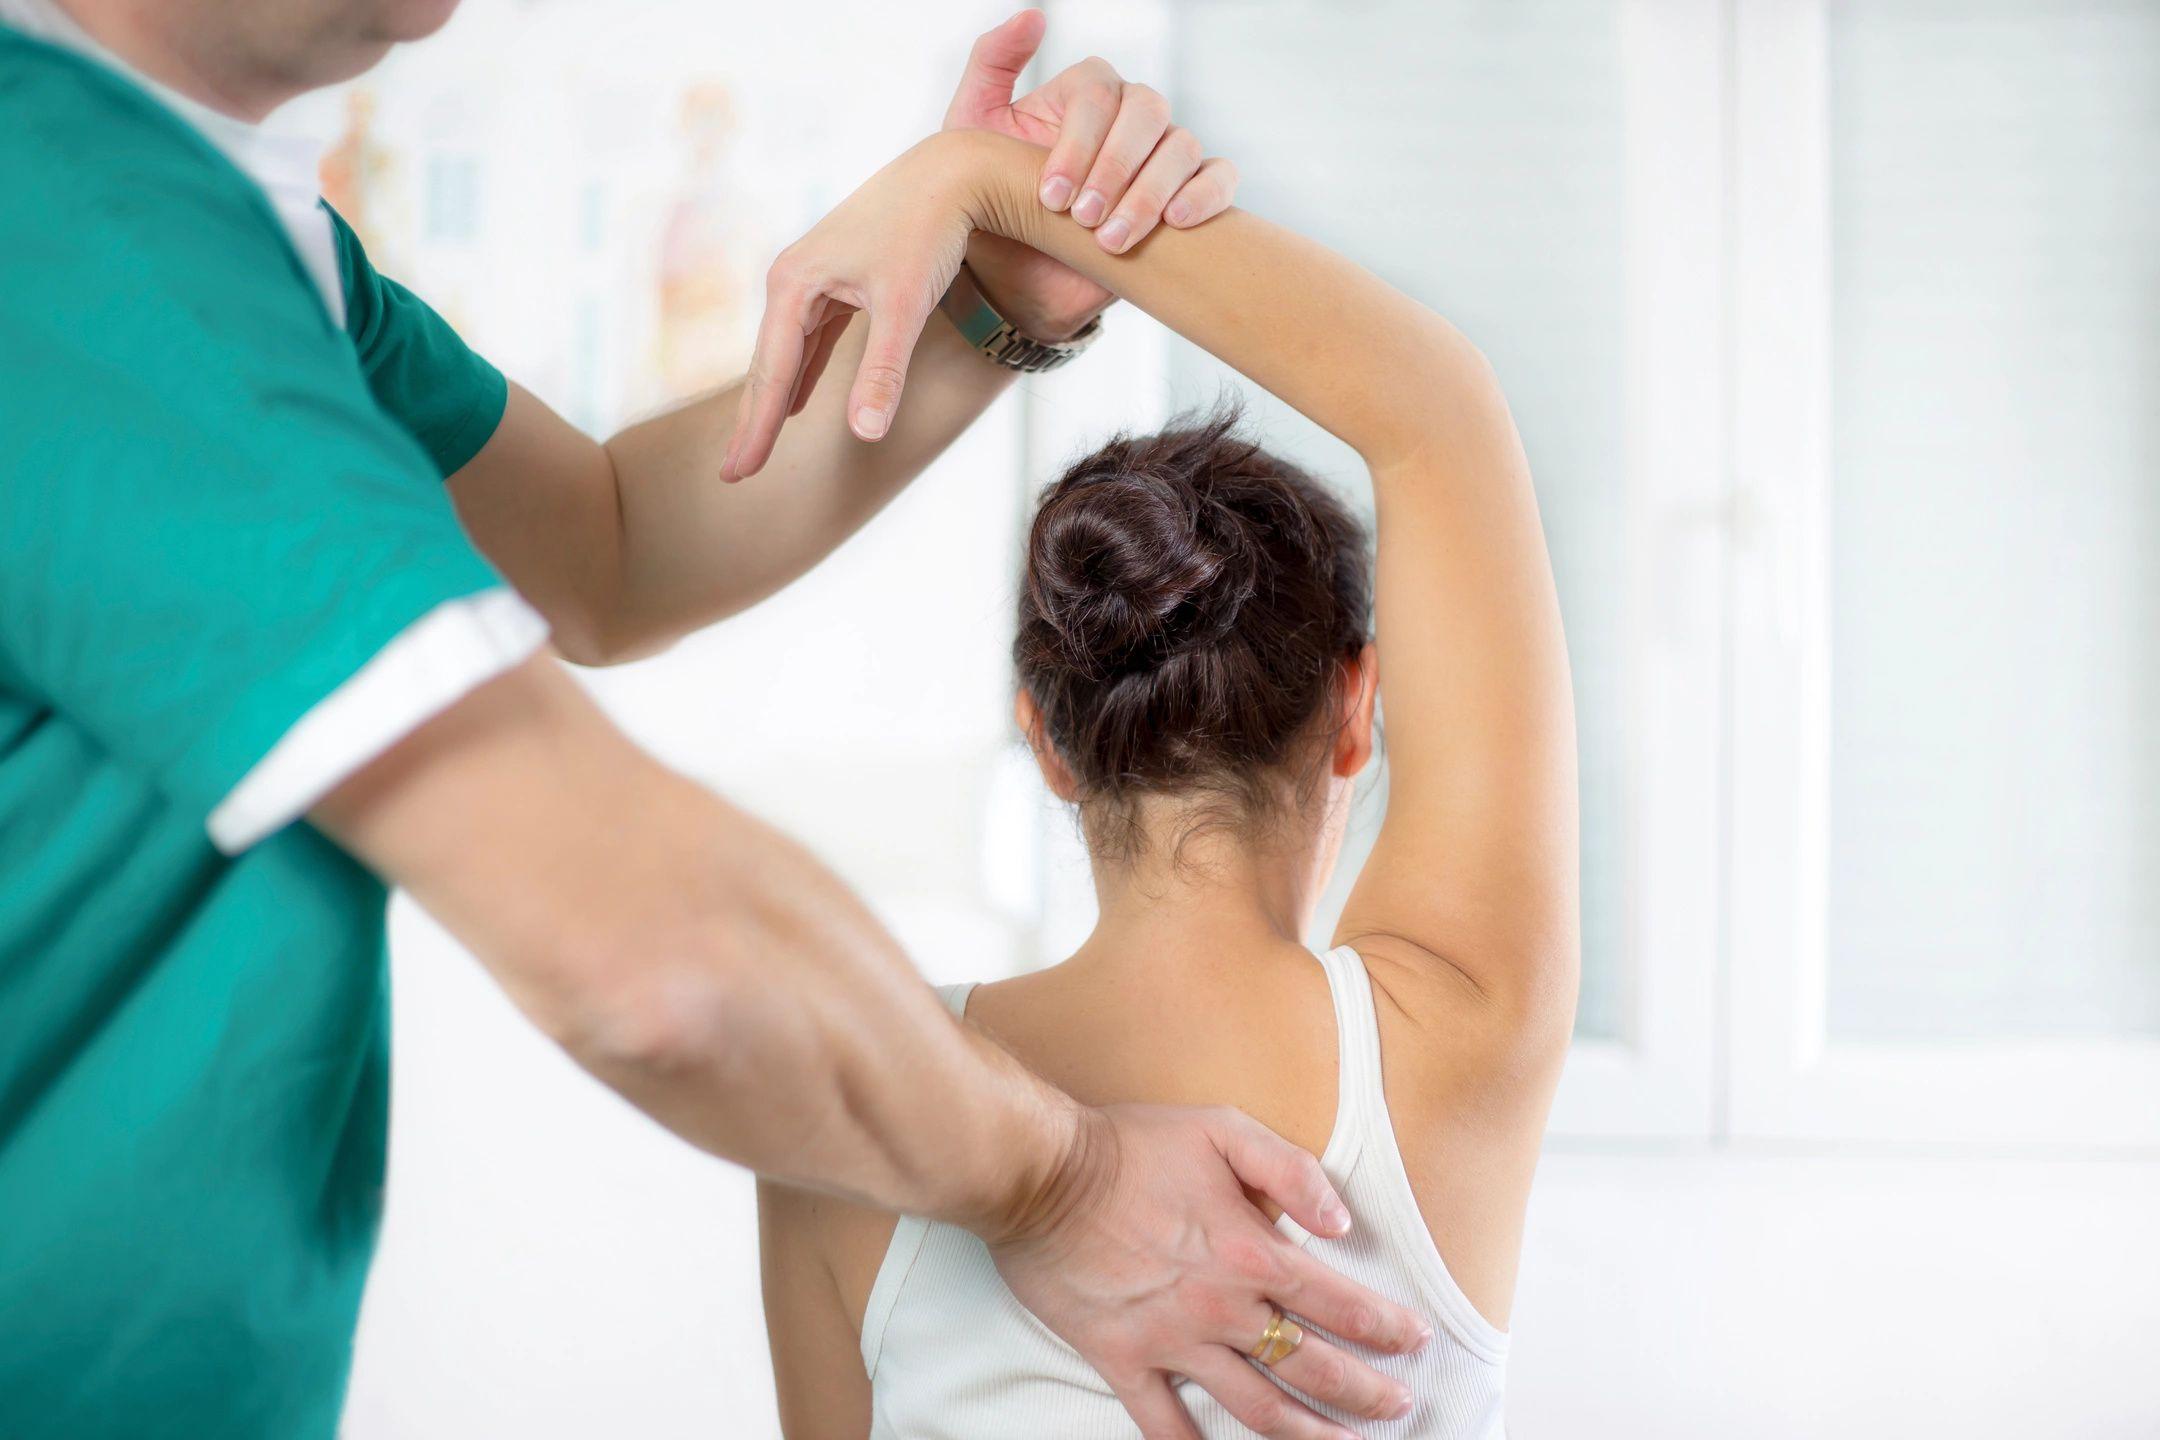 ergonomics and stretching guide